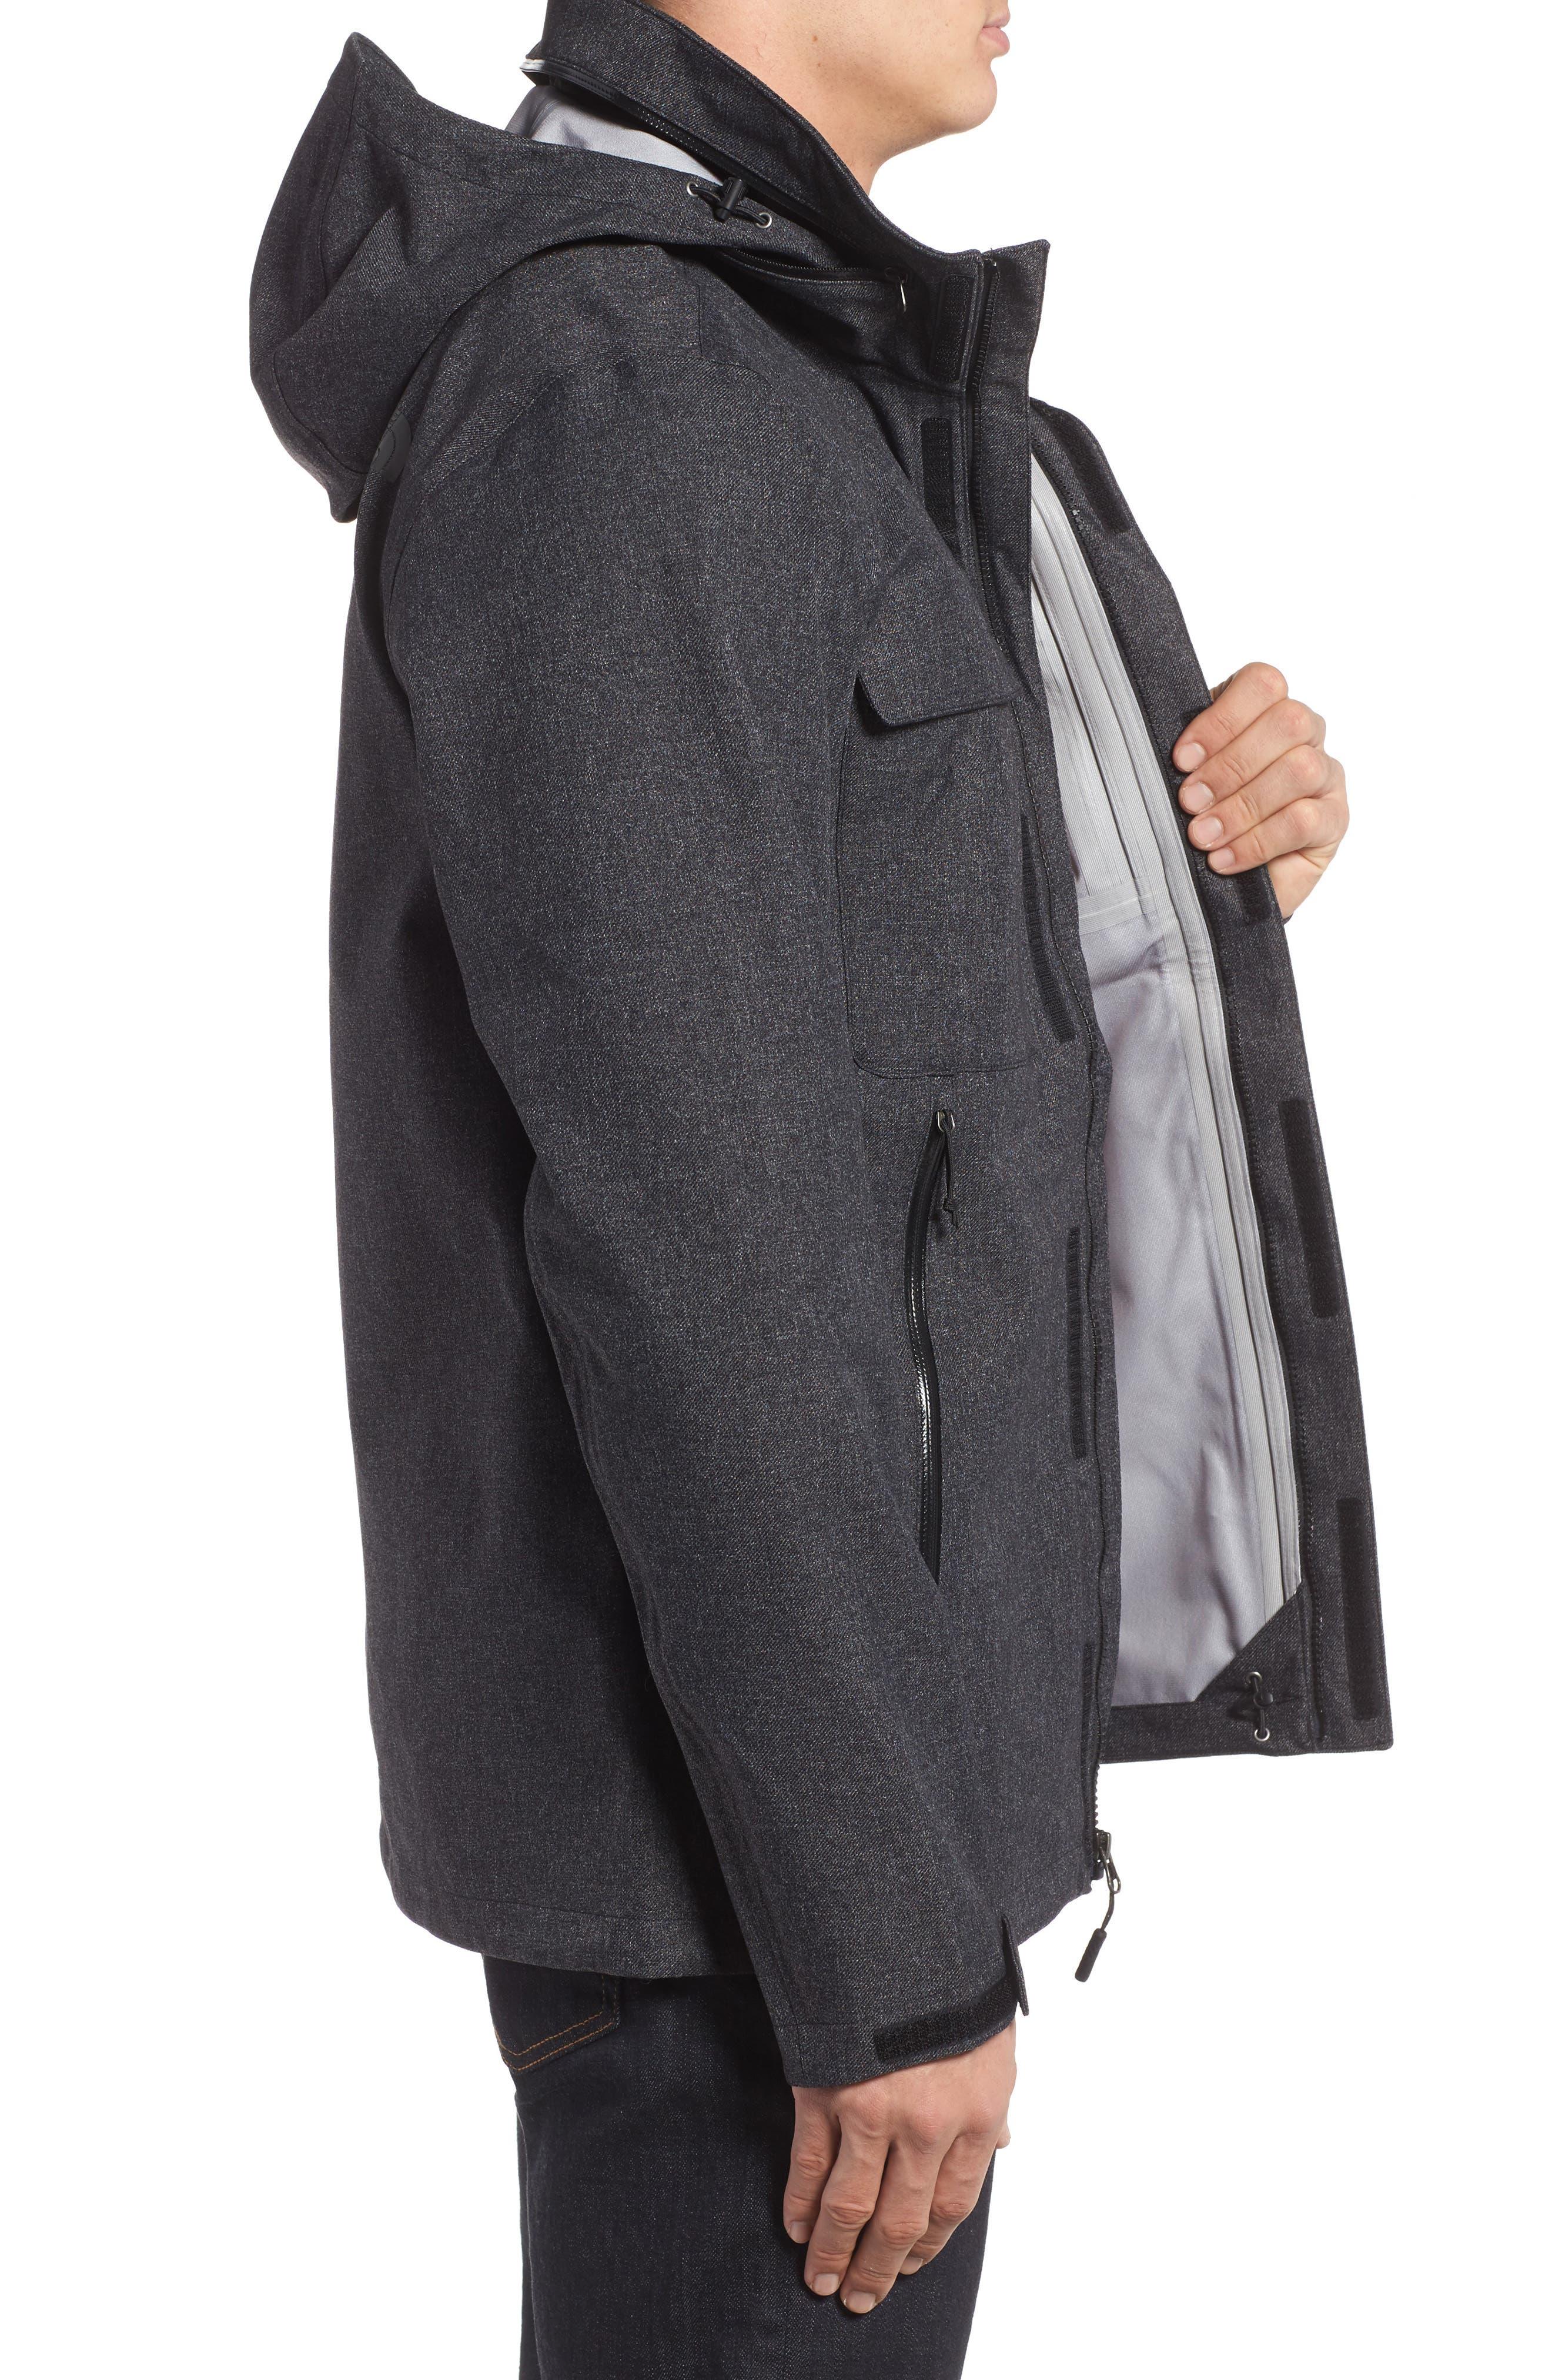 Kassler DryVent Field Jacket,                             Alternate thumbnail 3, color,                             001